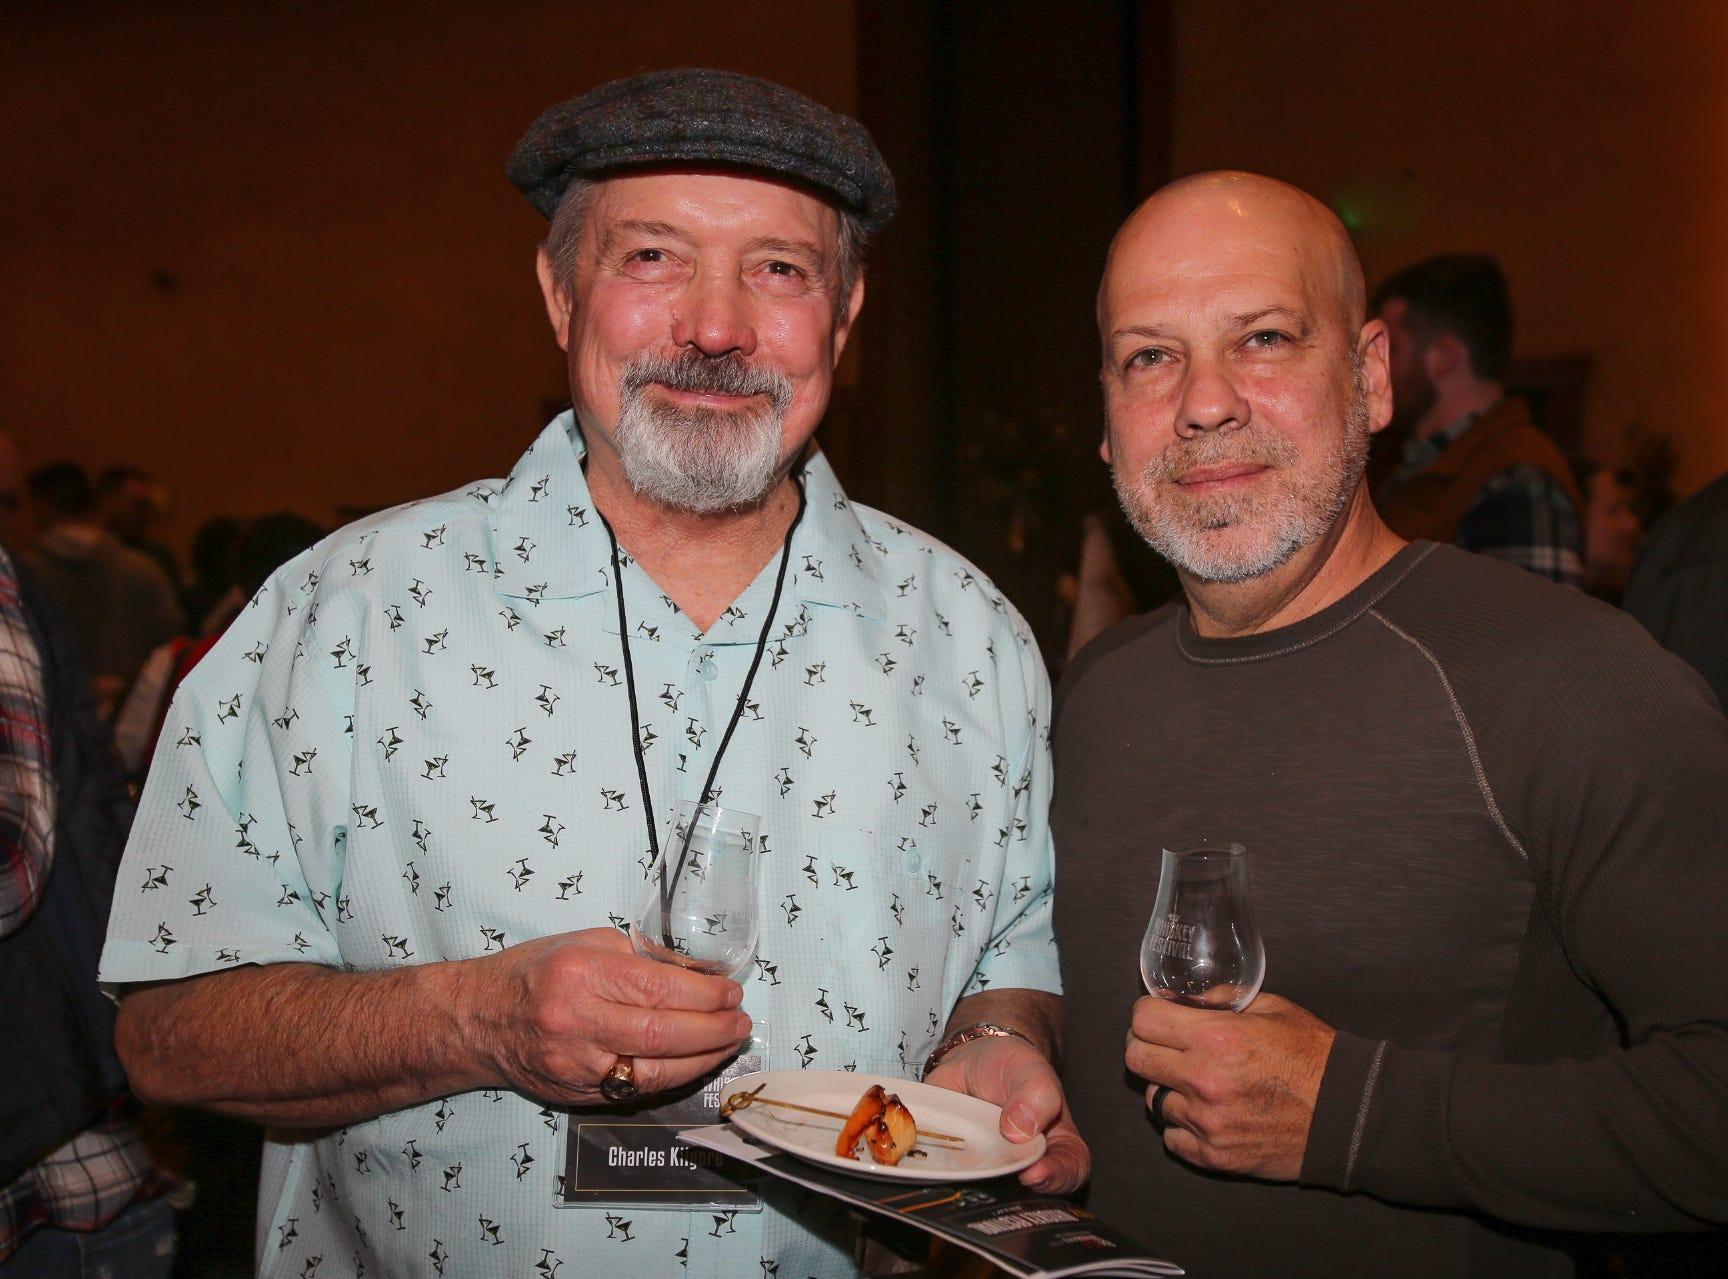 Charlie Kilgore and Steve Lerner